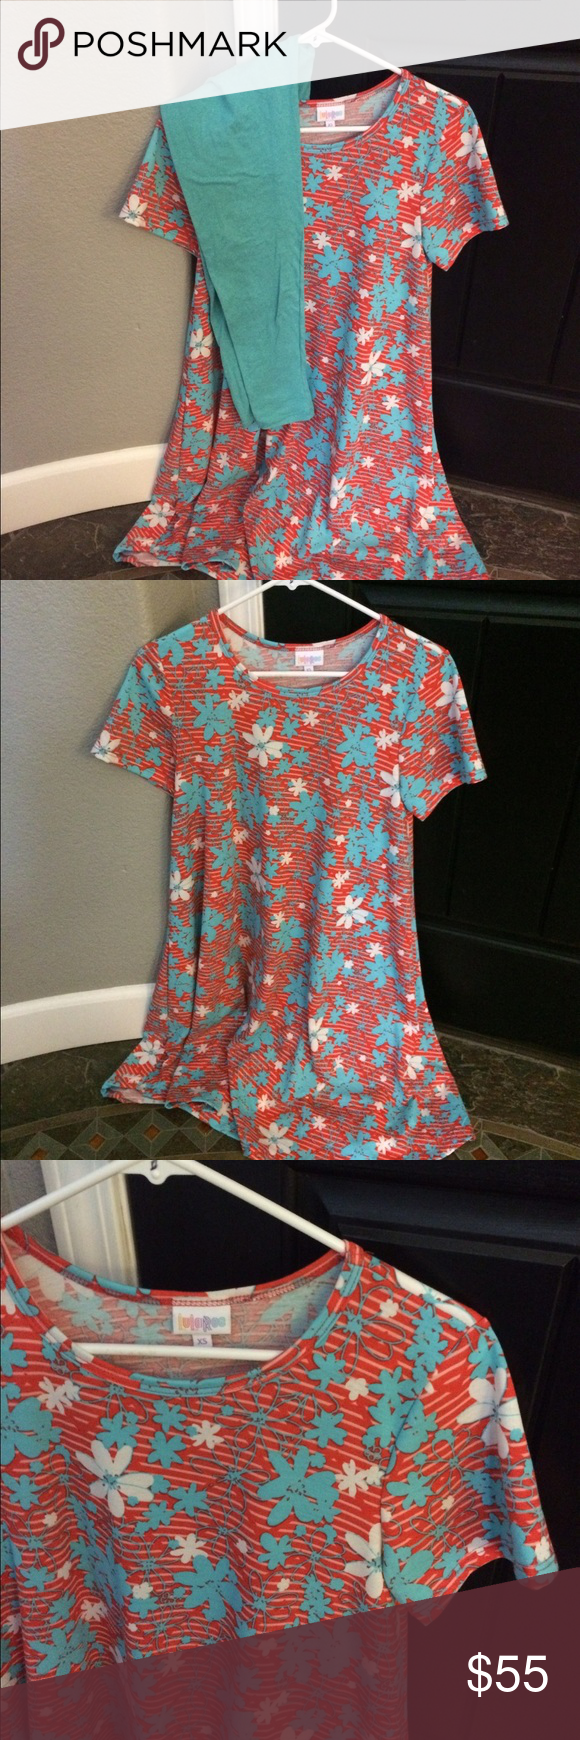 Lularoe SET Carly / OS leggings LLR SET XS Carly dress with OS leggings made in China. Cotton dress fabric. Cute LuLaRoe Dresses Midi